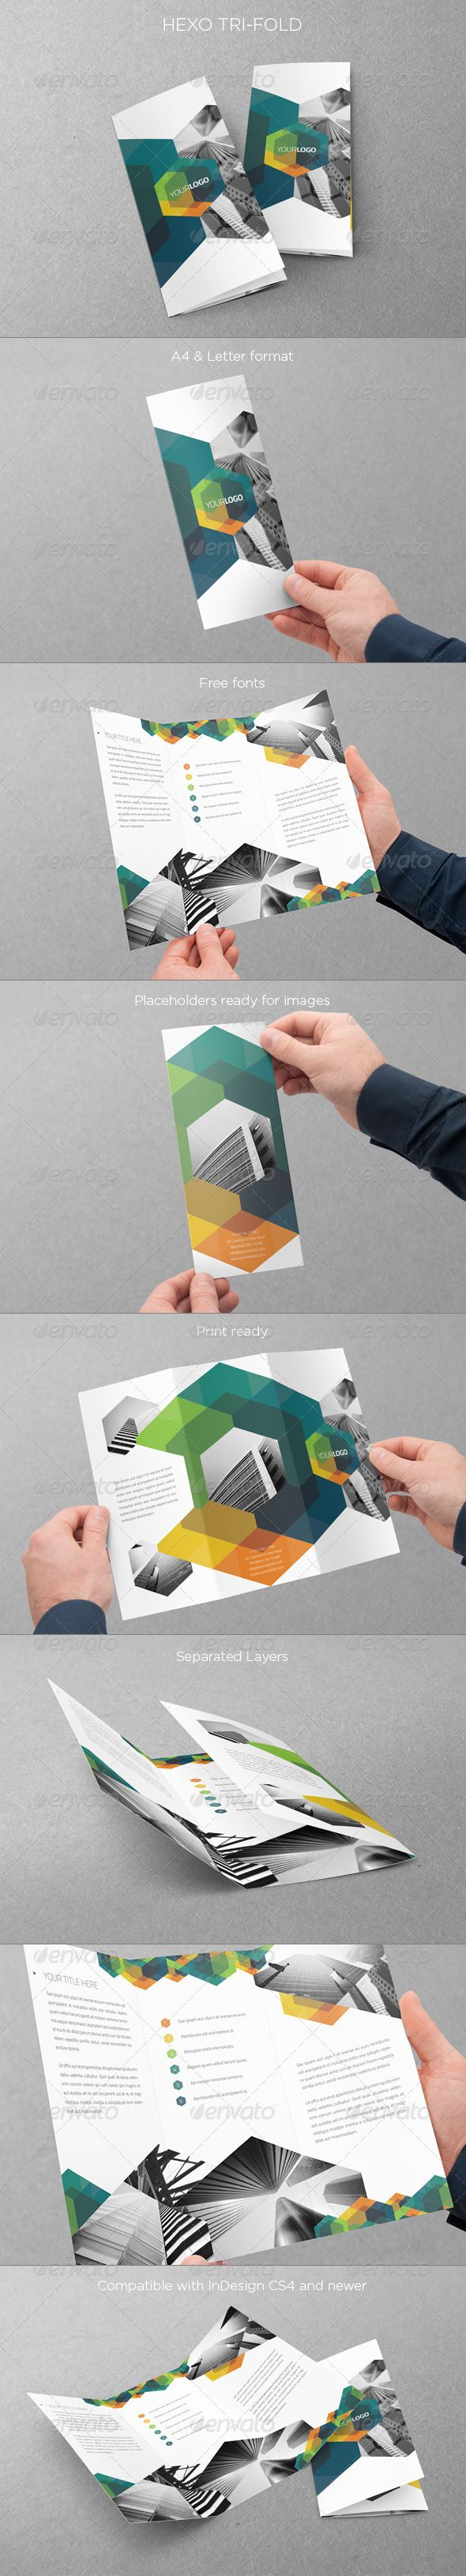 Modern Hexo Trifold - Brochures Print Templates